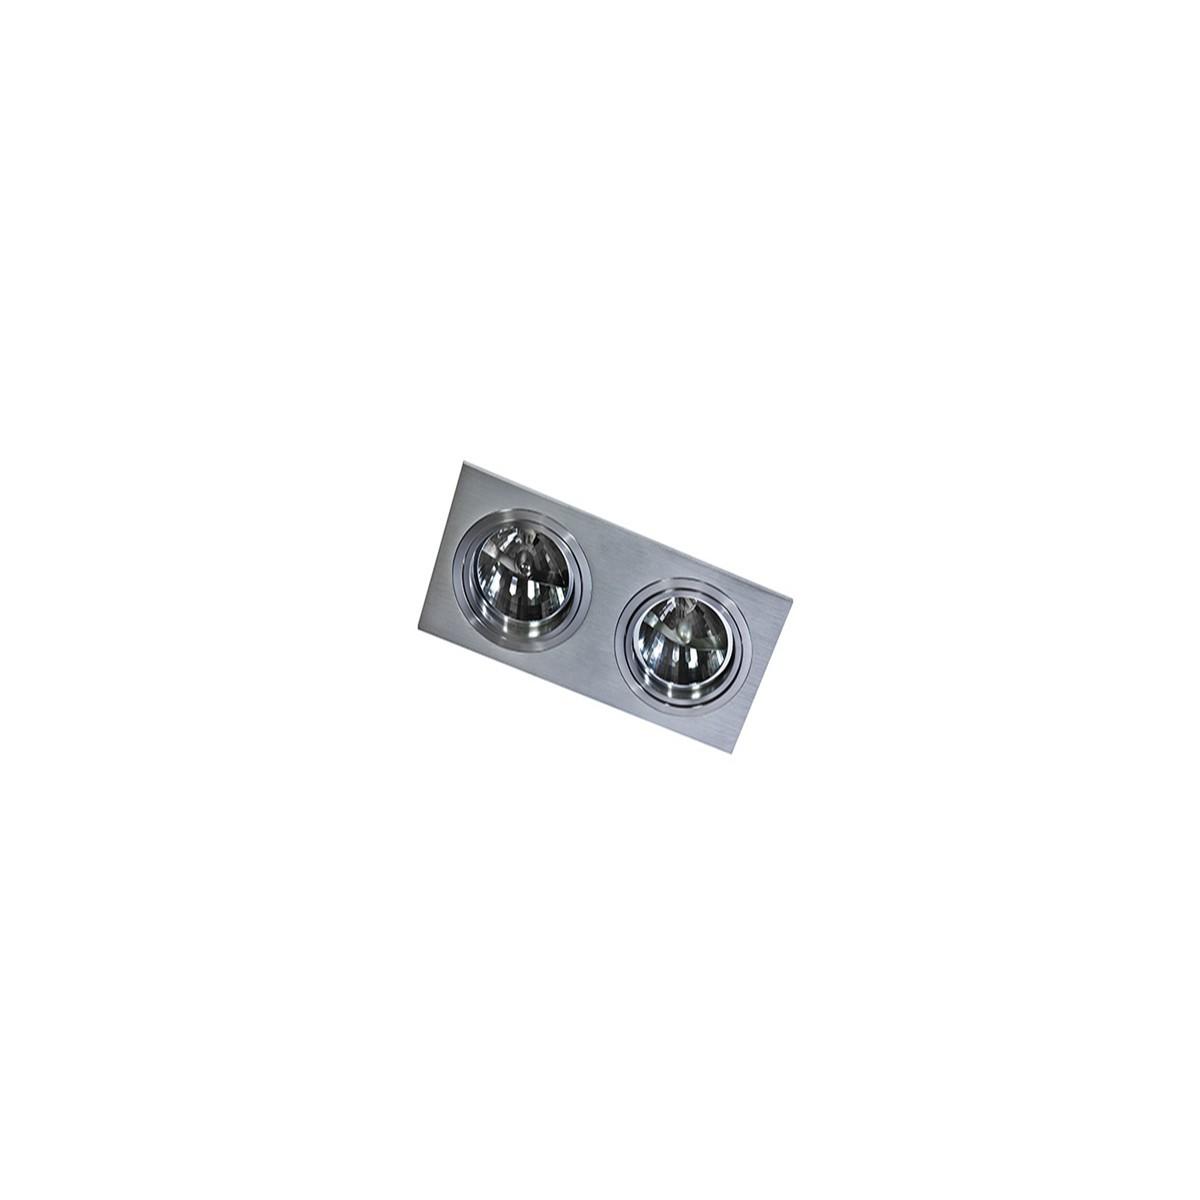 Azzardo SIRO 2 ALU 2xES111 Wpuszczana Aluminium AZ0770